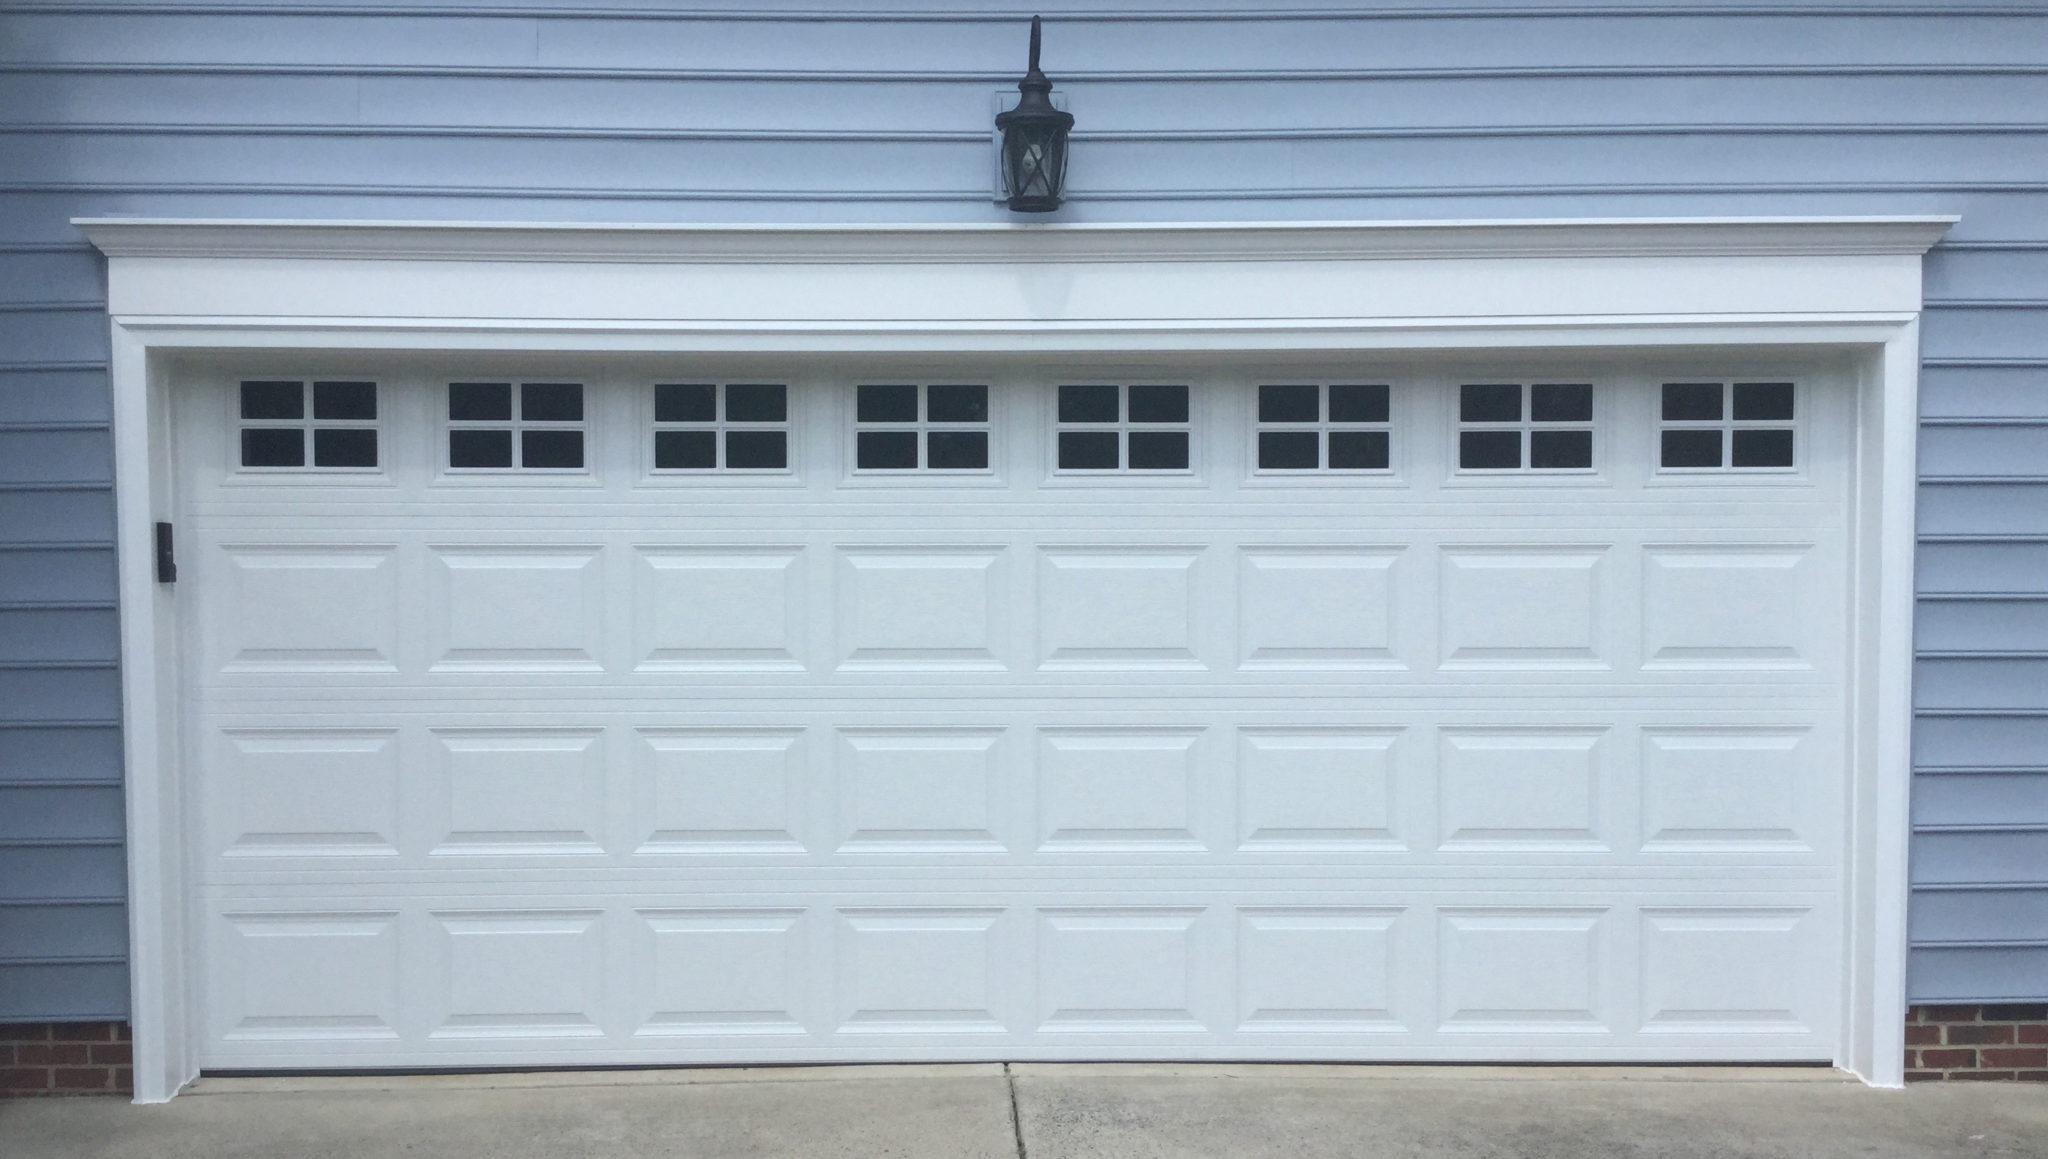 3610 Residential Garage Door Installation | A Plus Garage Doors on a plus carpet cleaning, a plus signs, a plus tires,